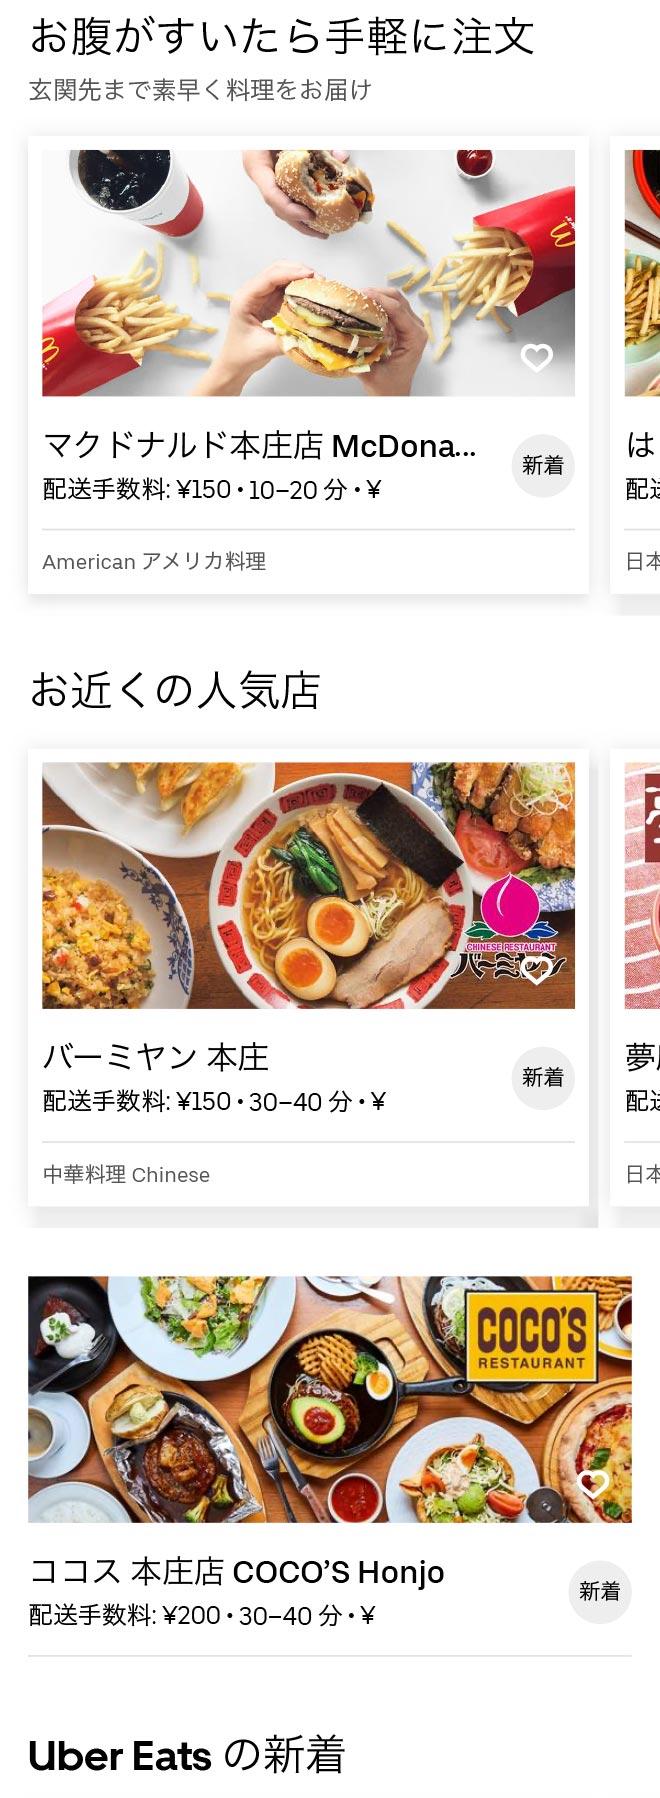 Honjo menu 2010 1